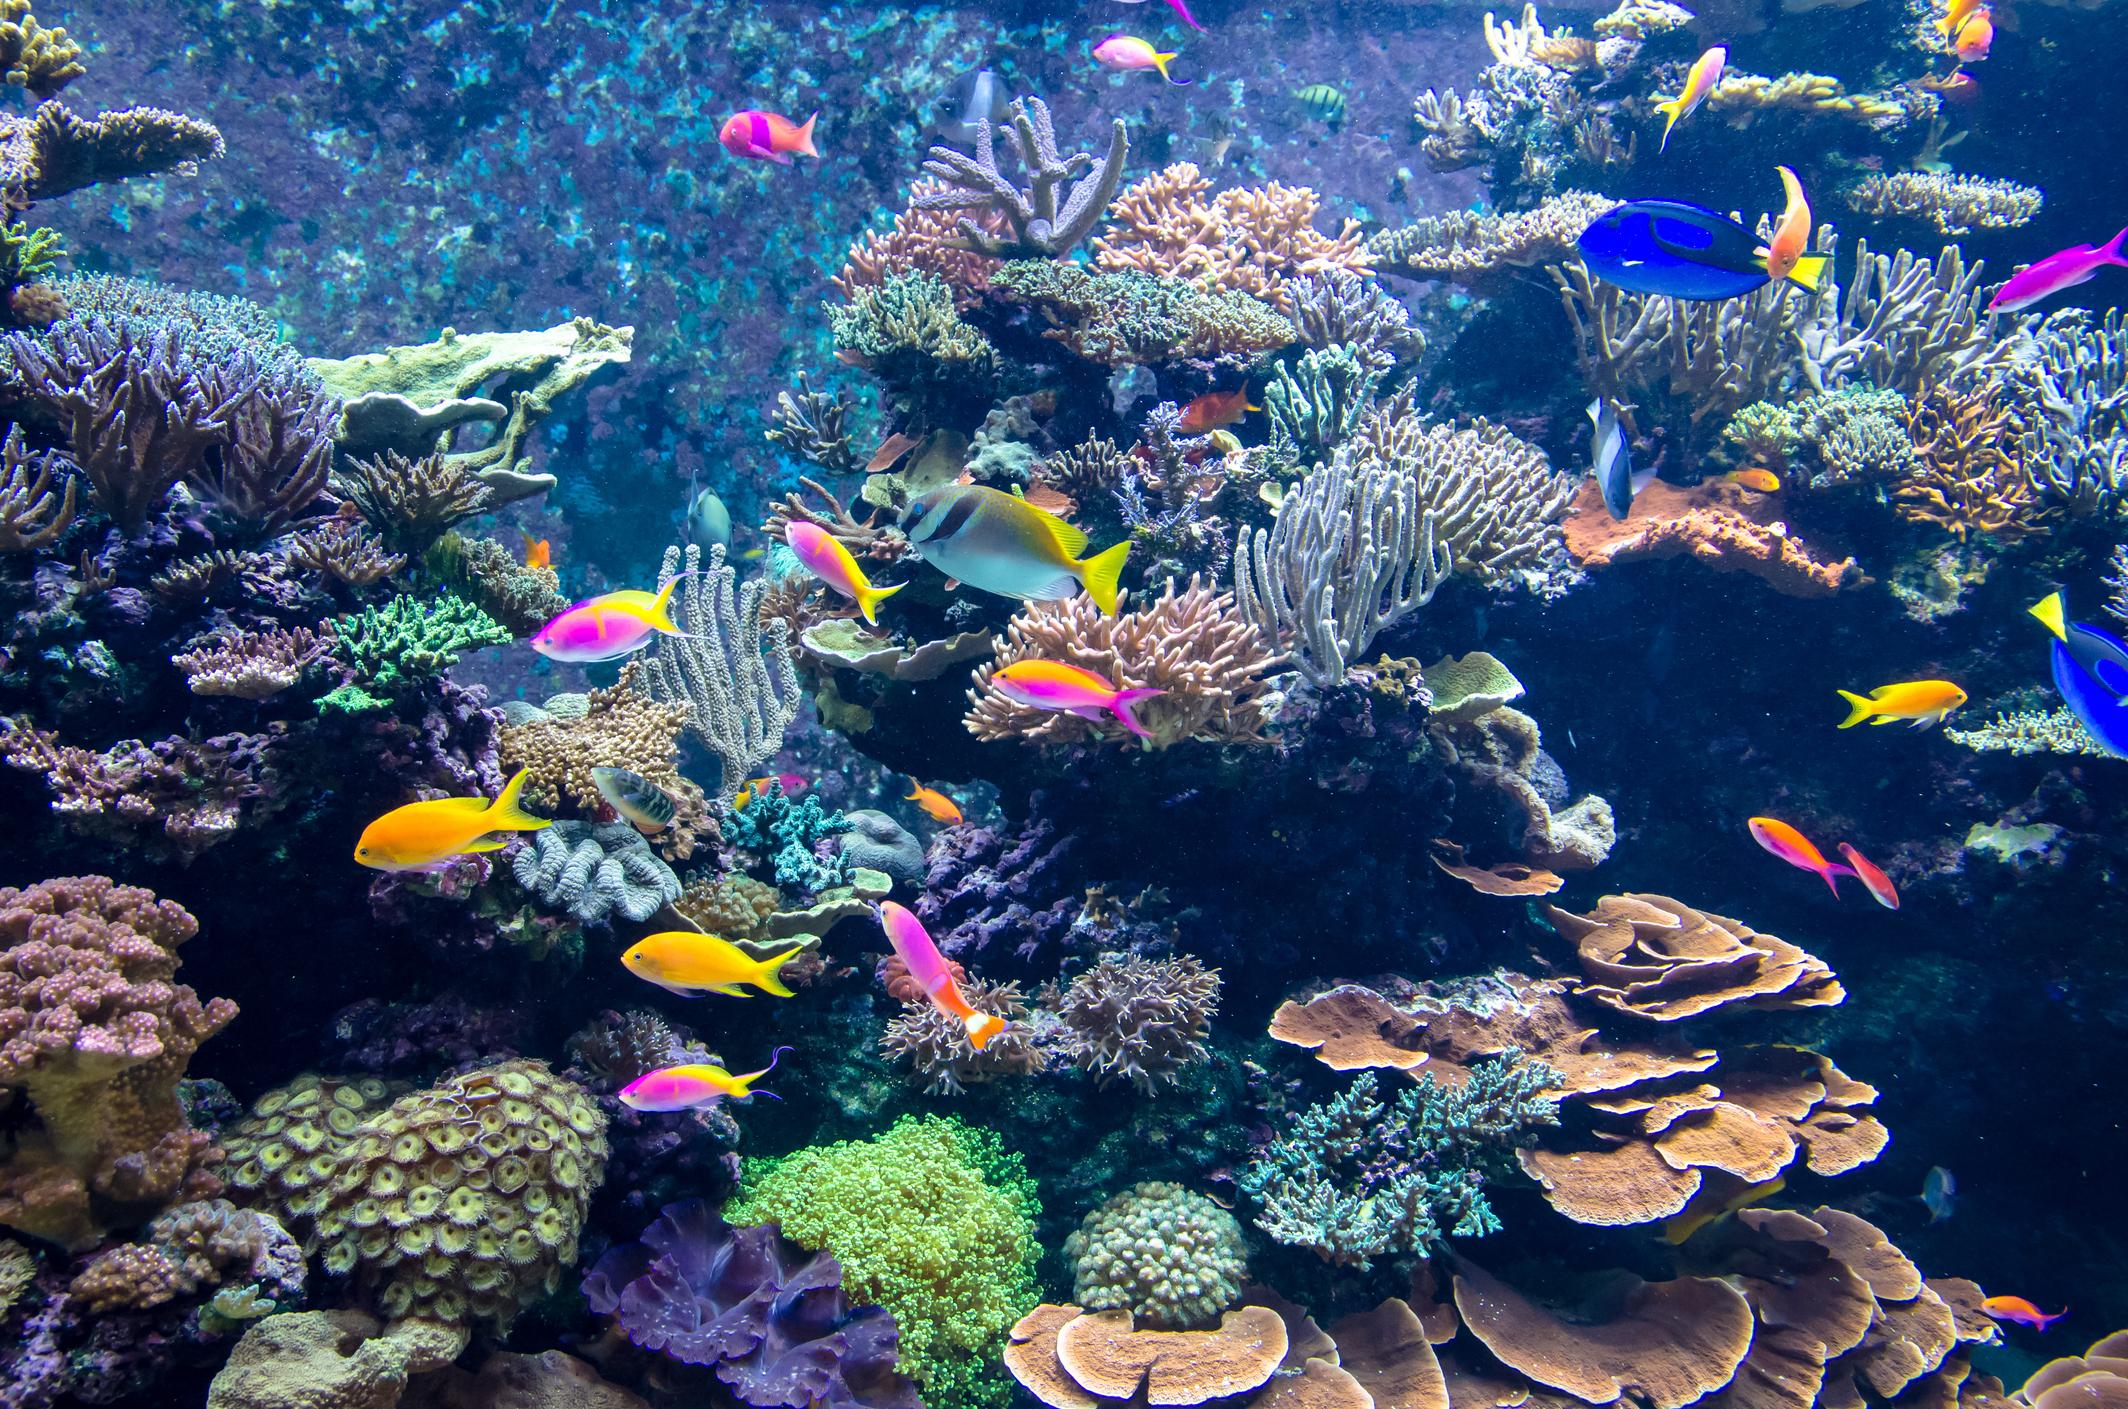 ish Tank, Aquarium, Scenics, Transparent, Multi Colored, Below, Panoramic, Underwater, Singapore, Plant, Coral, Fish, Animal, Sunbeam, Light - Natural Phenomenon, Bubble, Rock - Object, Reef, Landscape, Sea, Water, underwaterworld